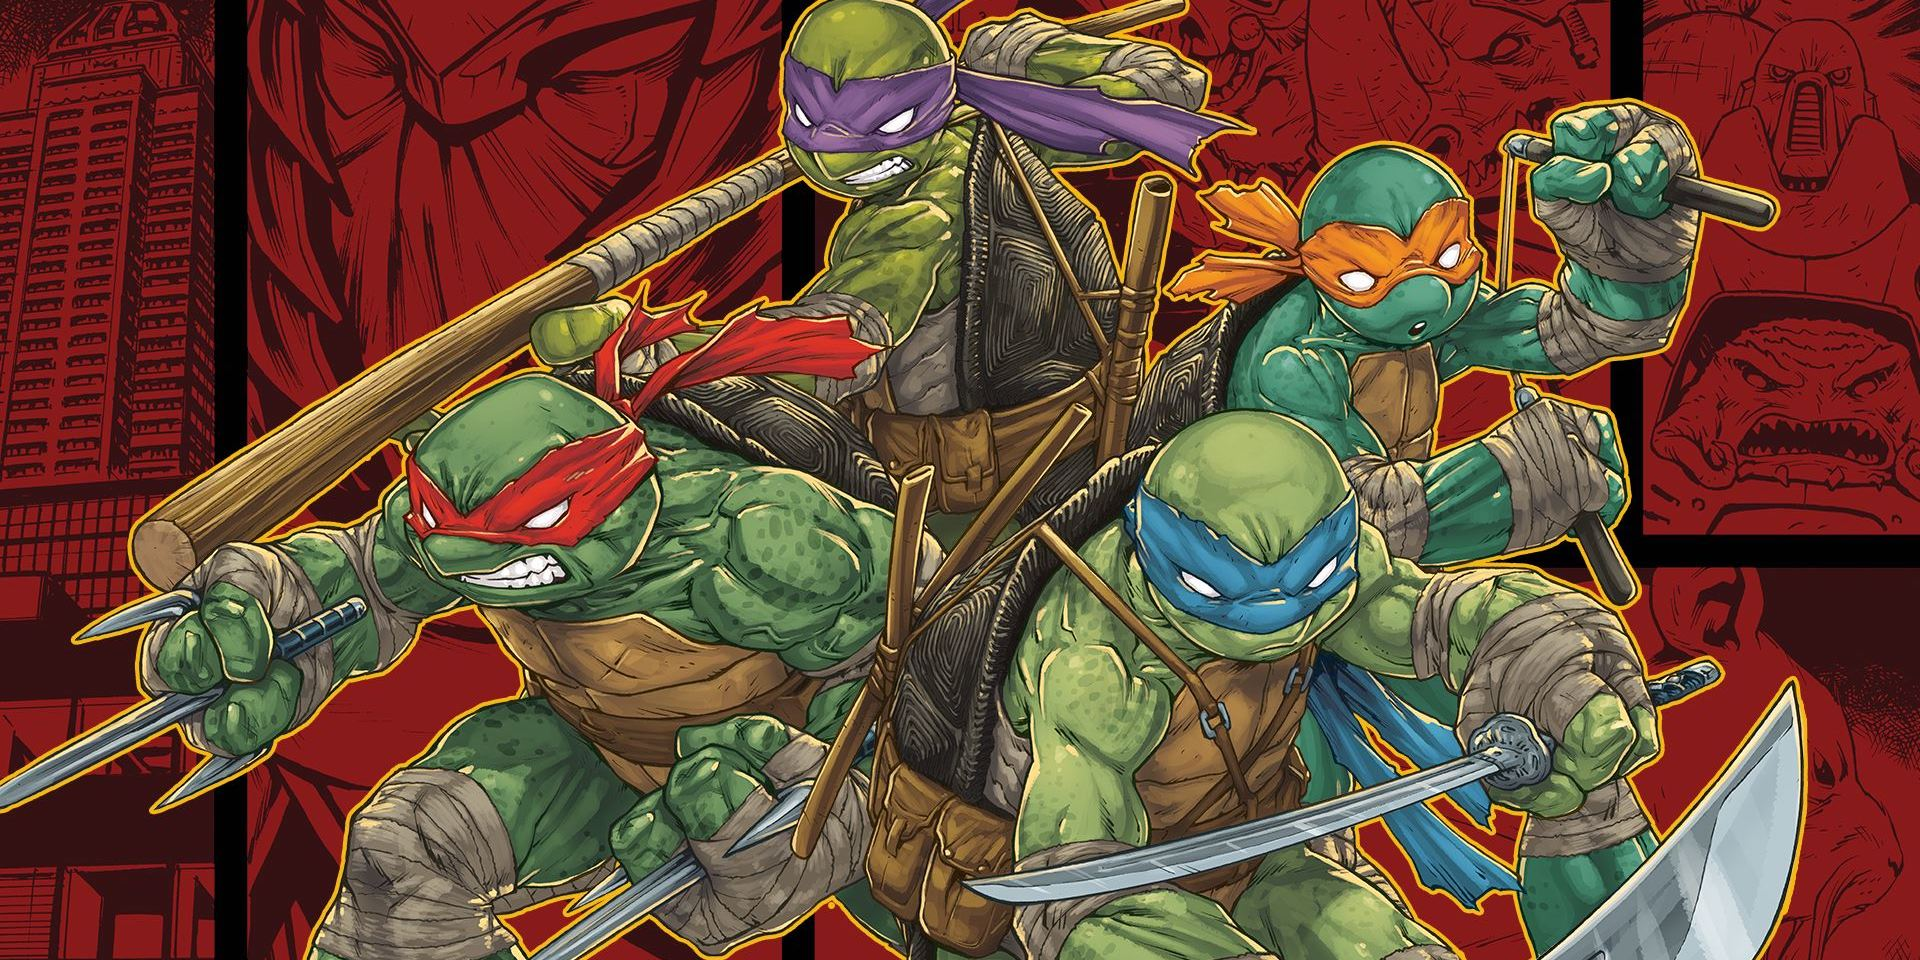 Teenage mutant ninja turtles comic wallpaper - photo#41